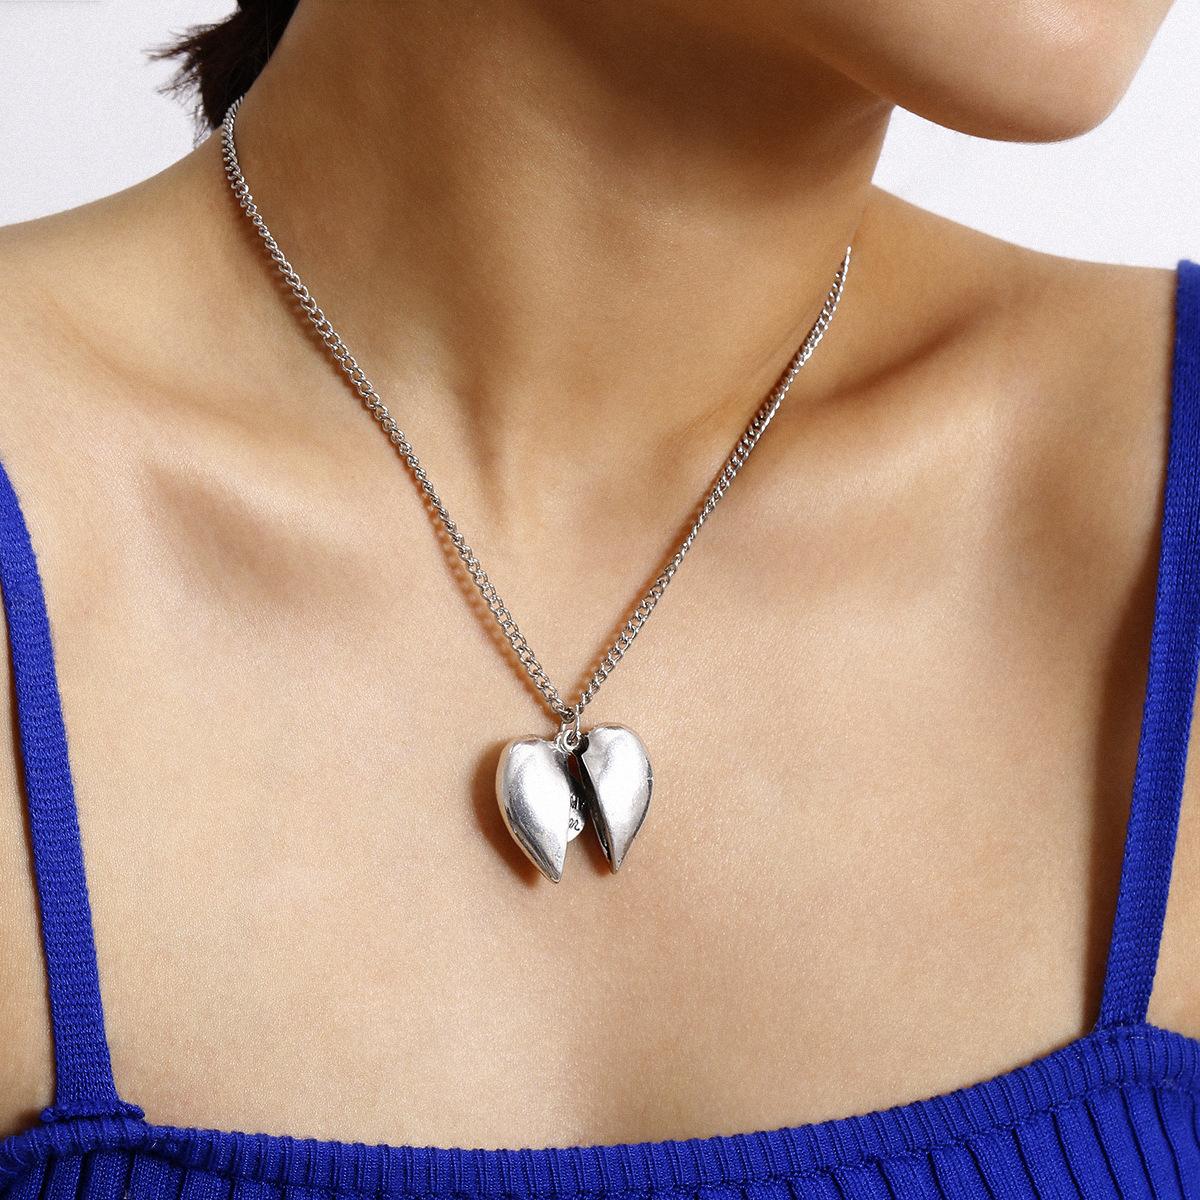 New fashion retro wild tassels geometric necklace creative opening peach heart pendant necklace women NHXR204535